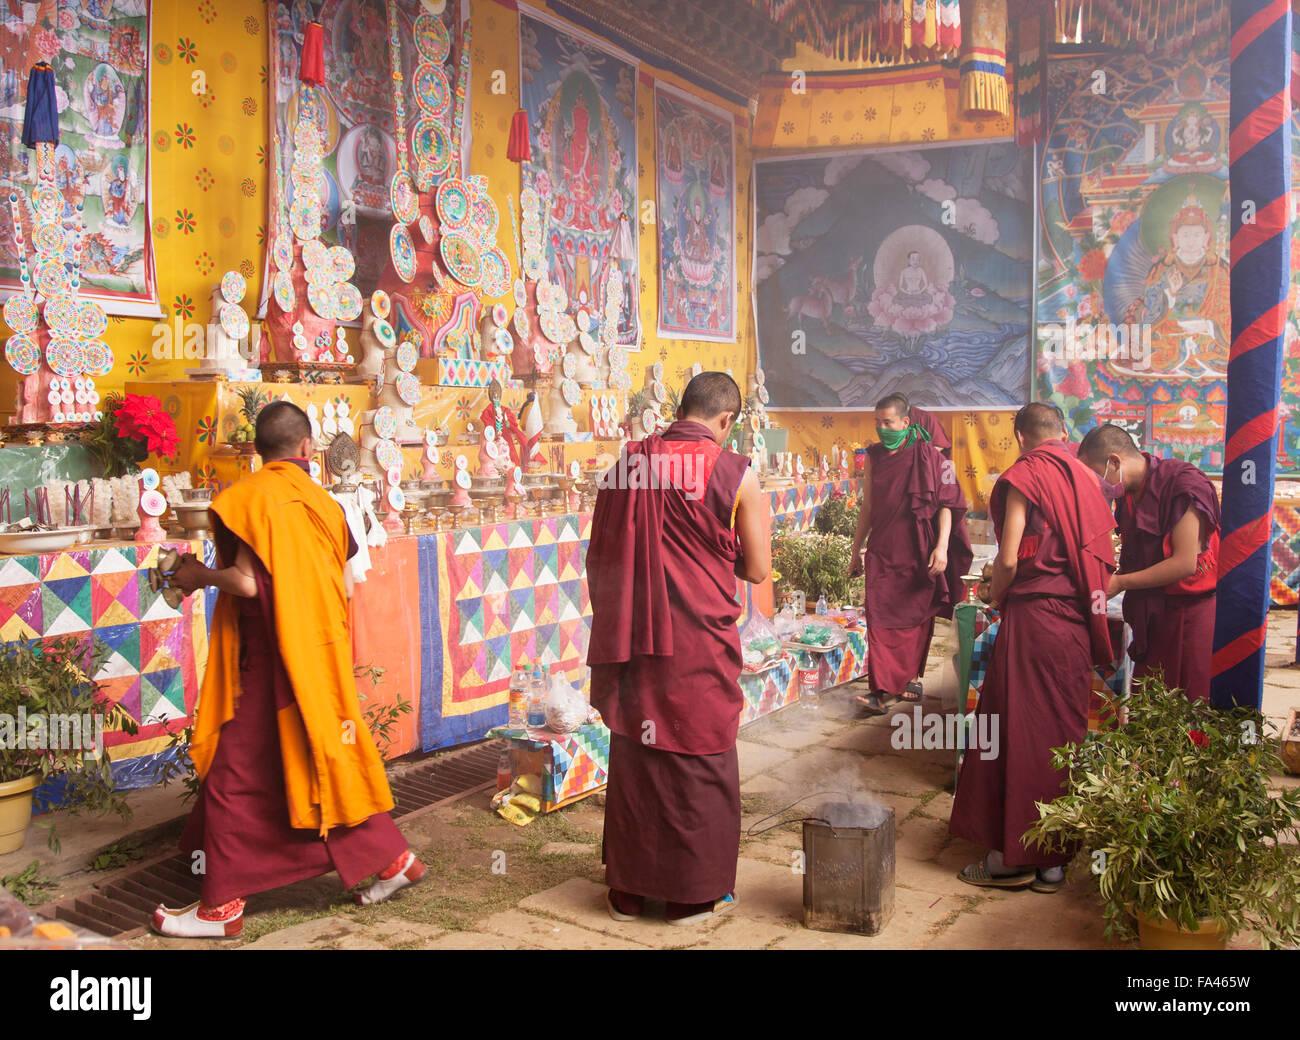 Preparing the candles at the Gangteng monastery in Phobjikha, Bhutan - Stock Image